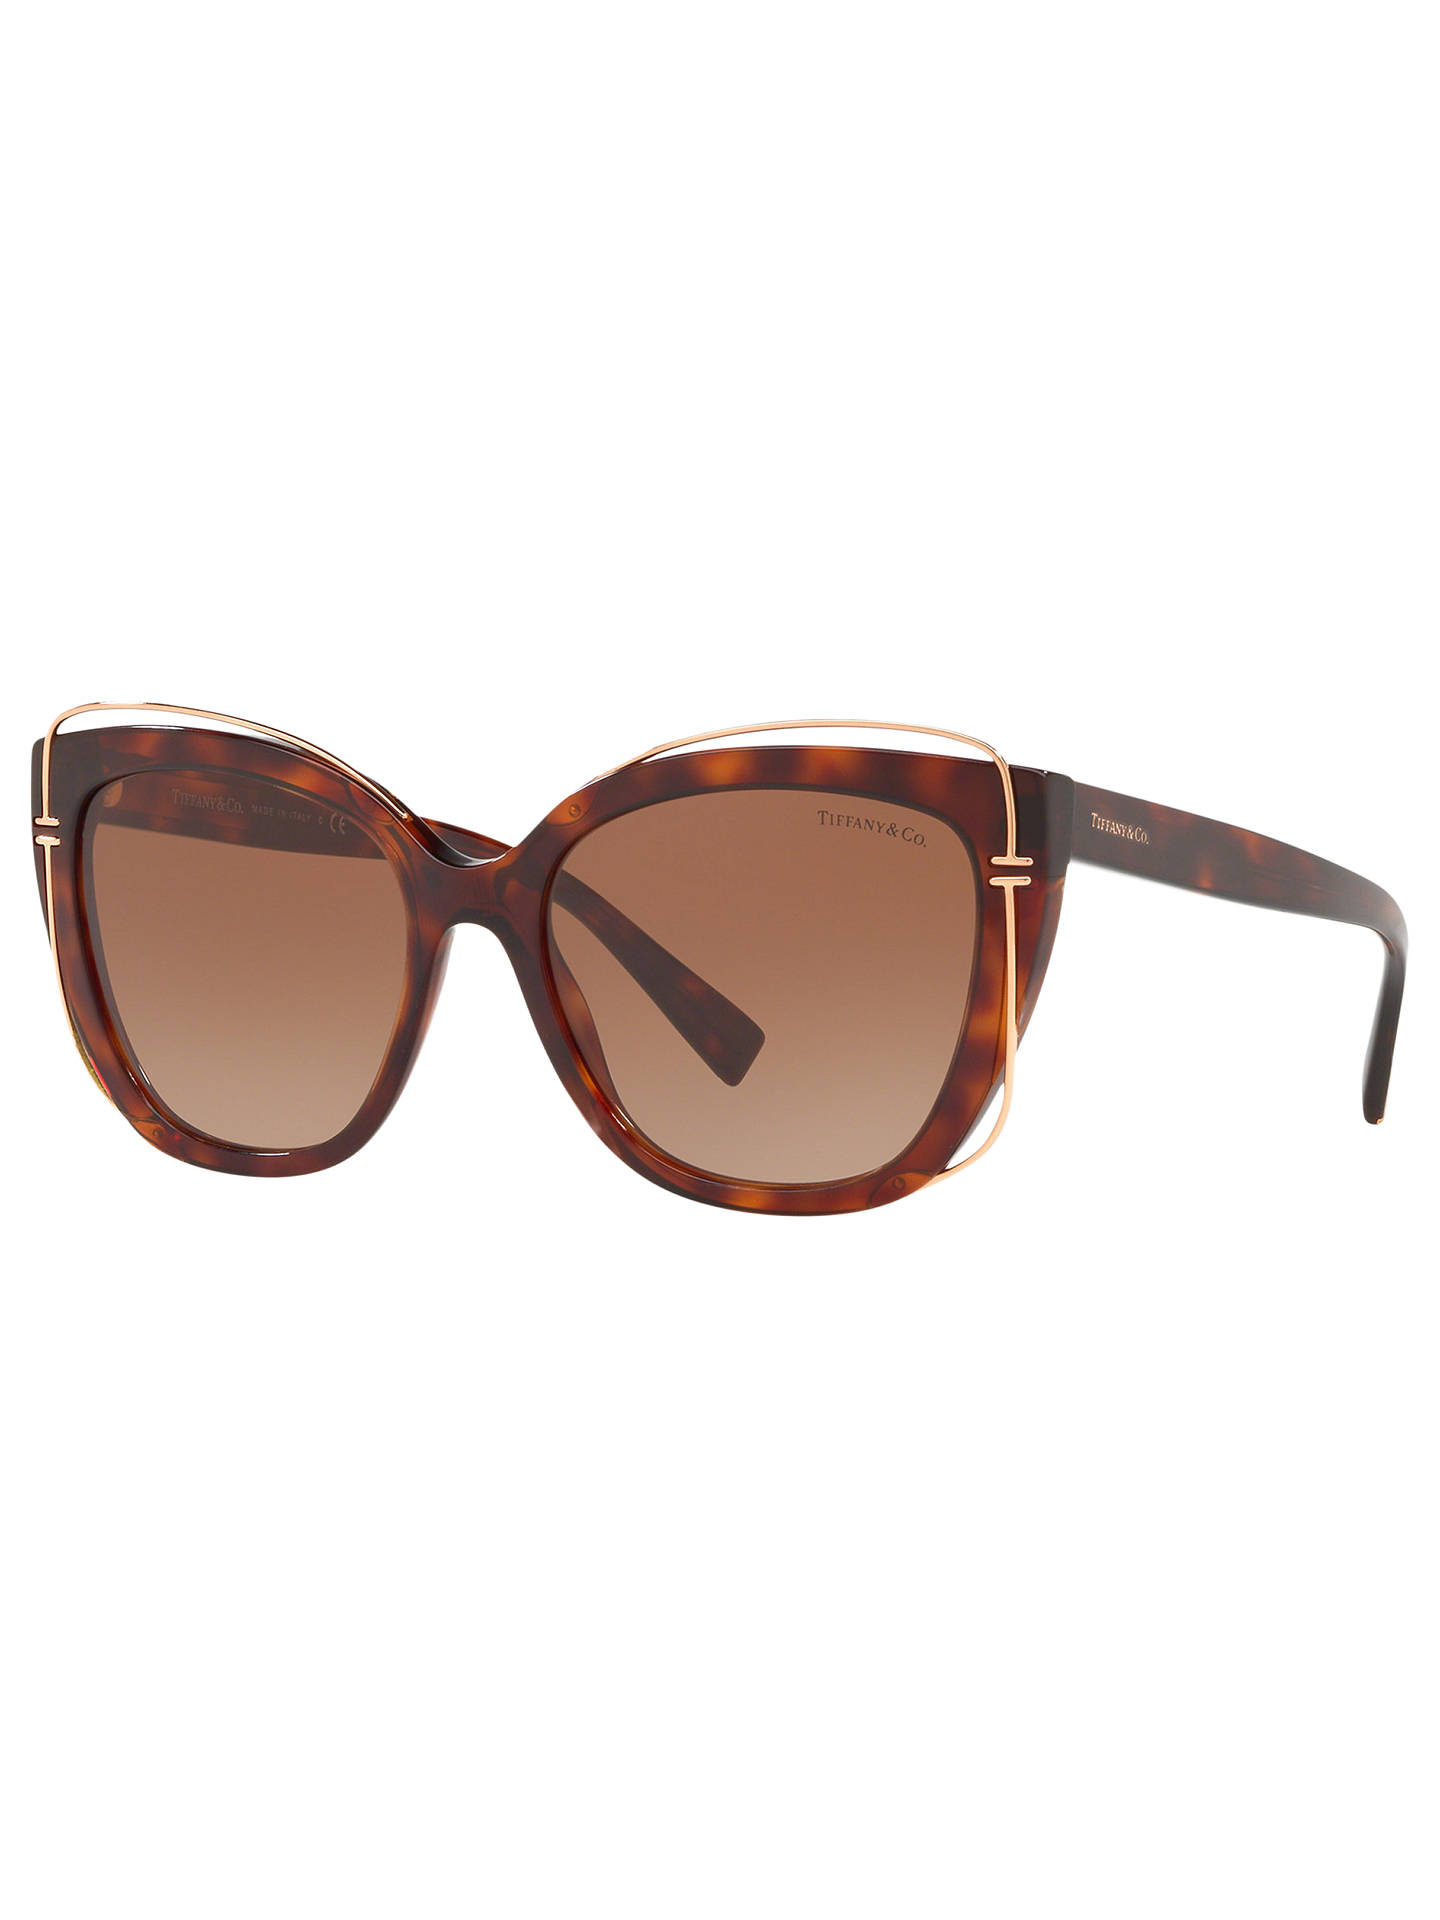 24b7574697632 Tiffany   Co TF4148 Women s Cat s Eye Sunglasses at John Lewis ...